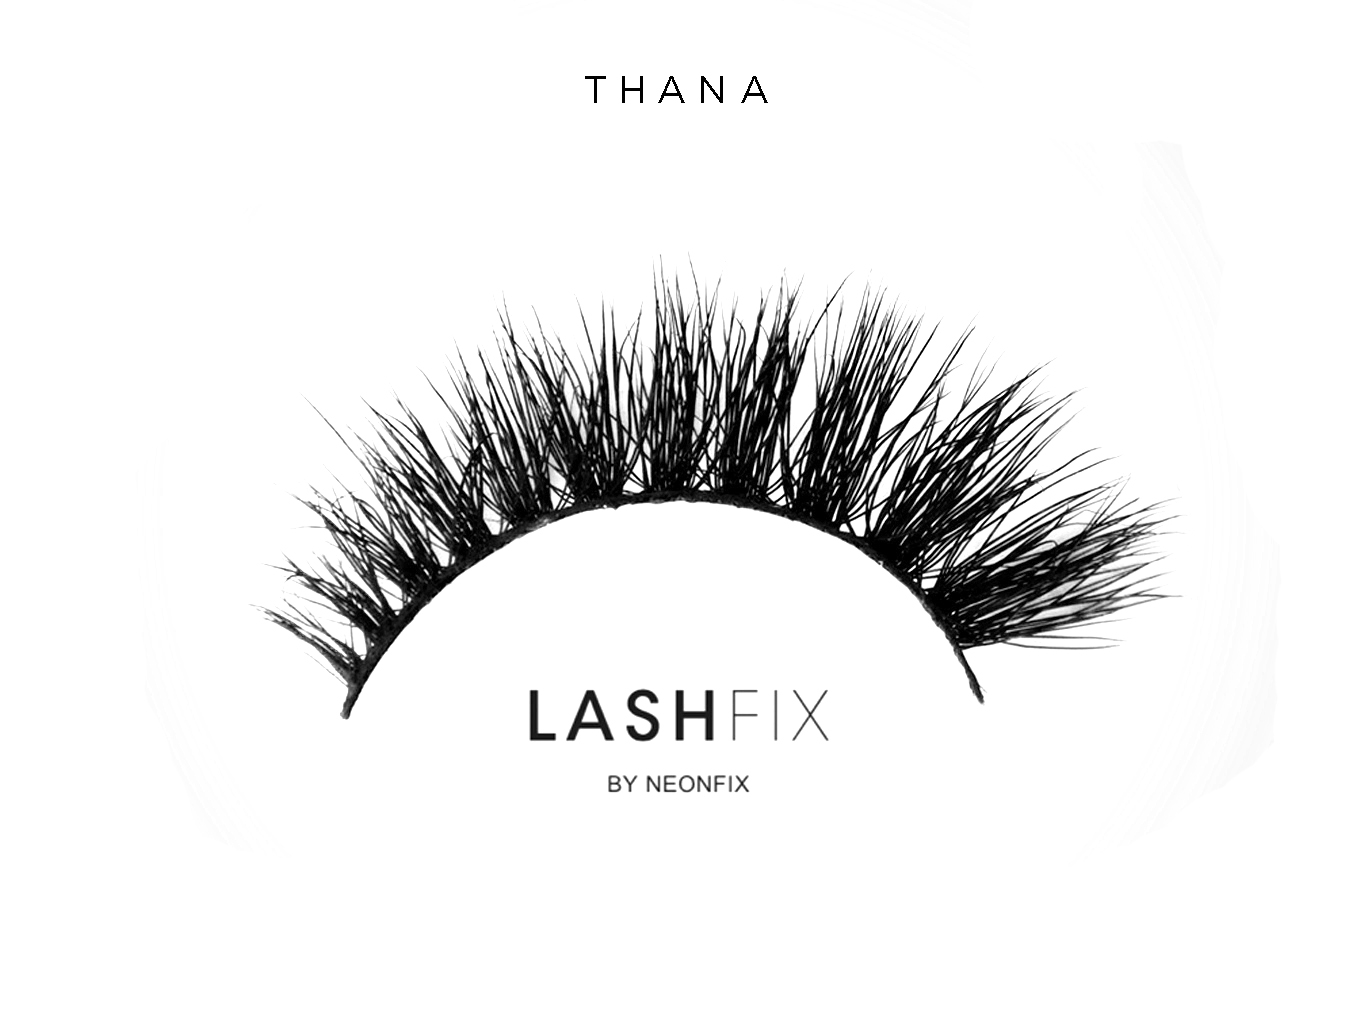 LASHFIX-THANA-FINAL.jpg